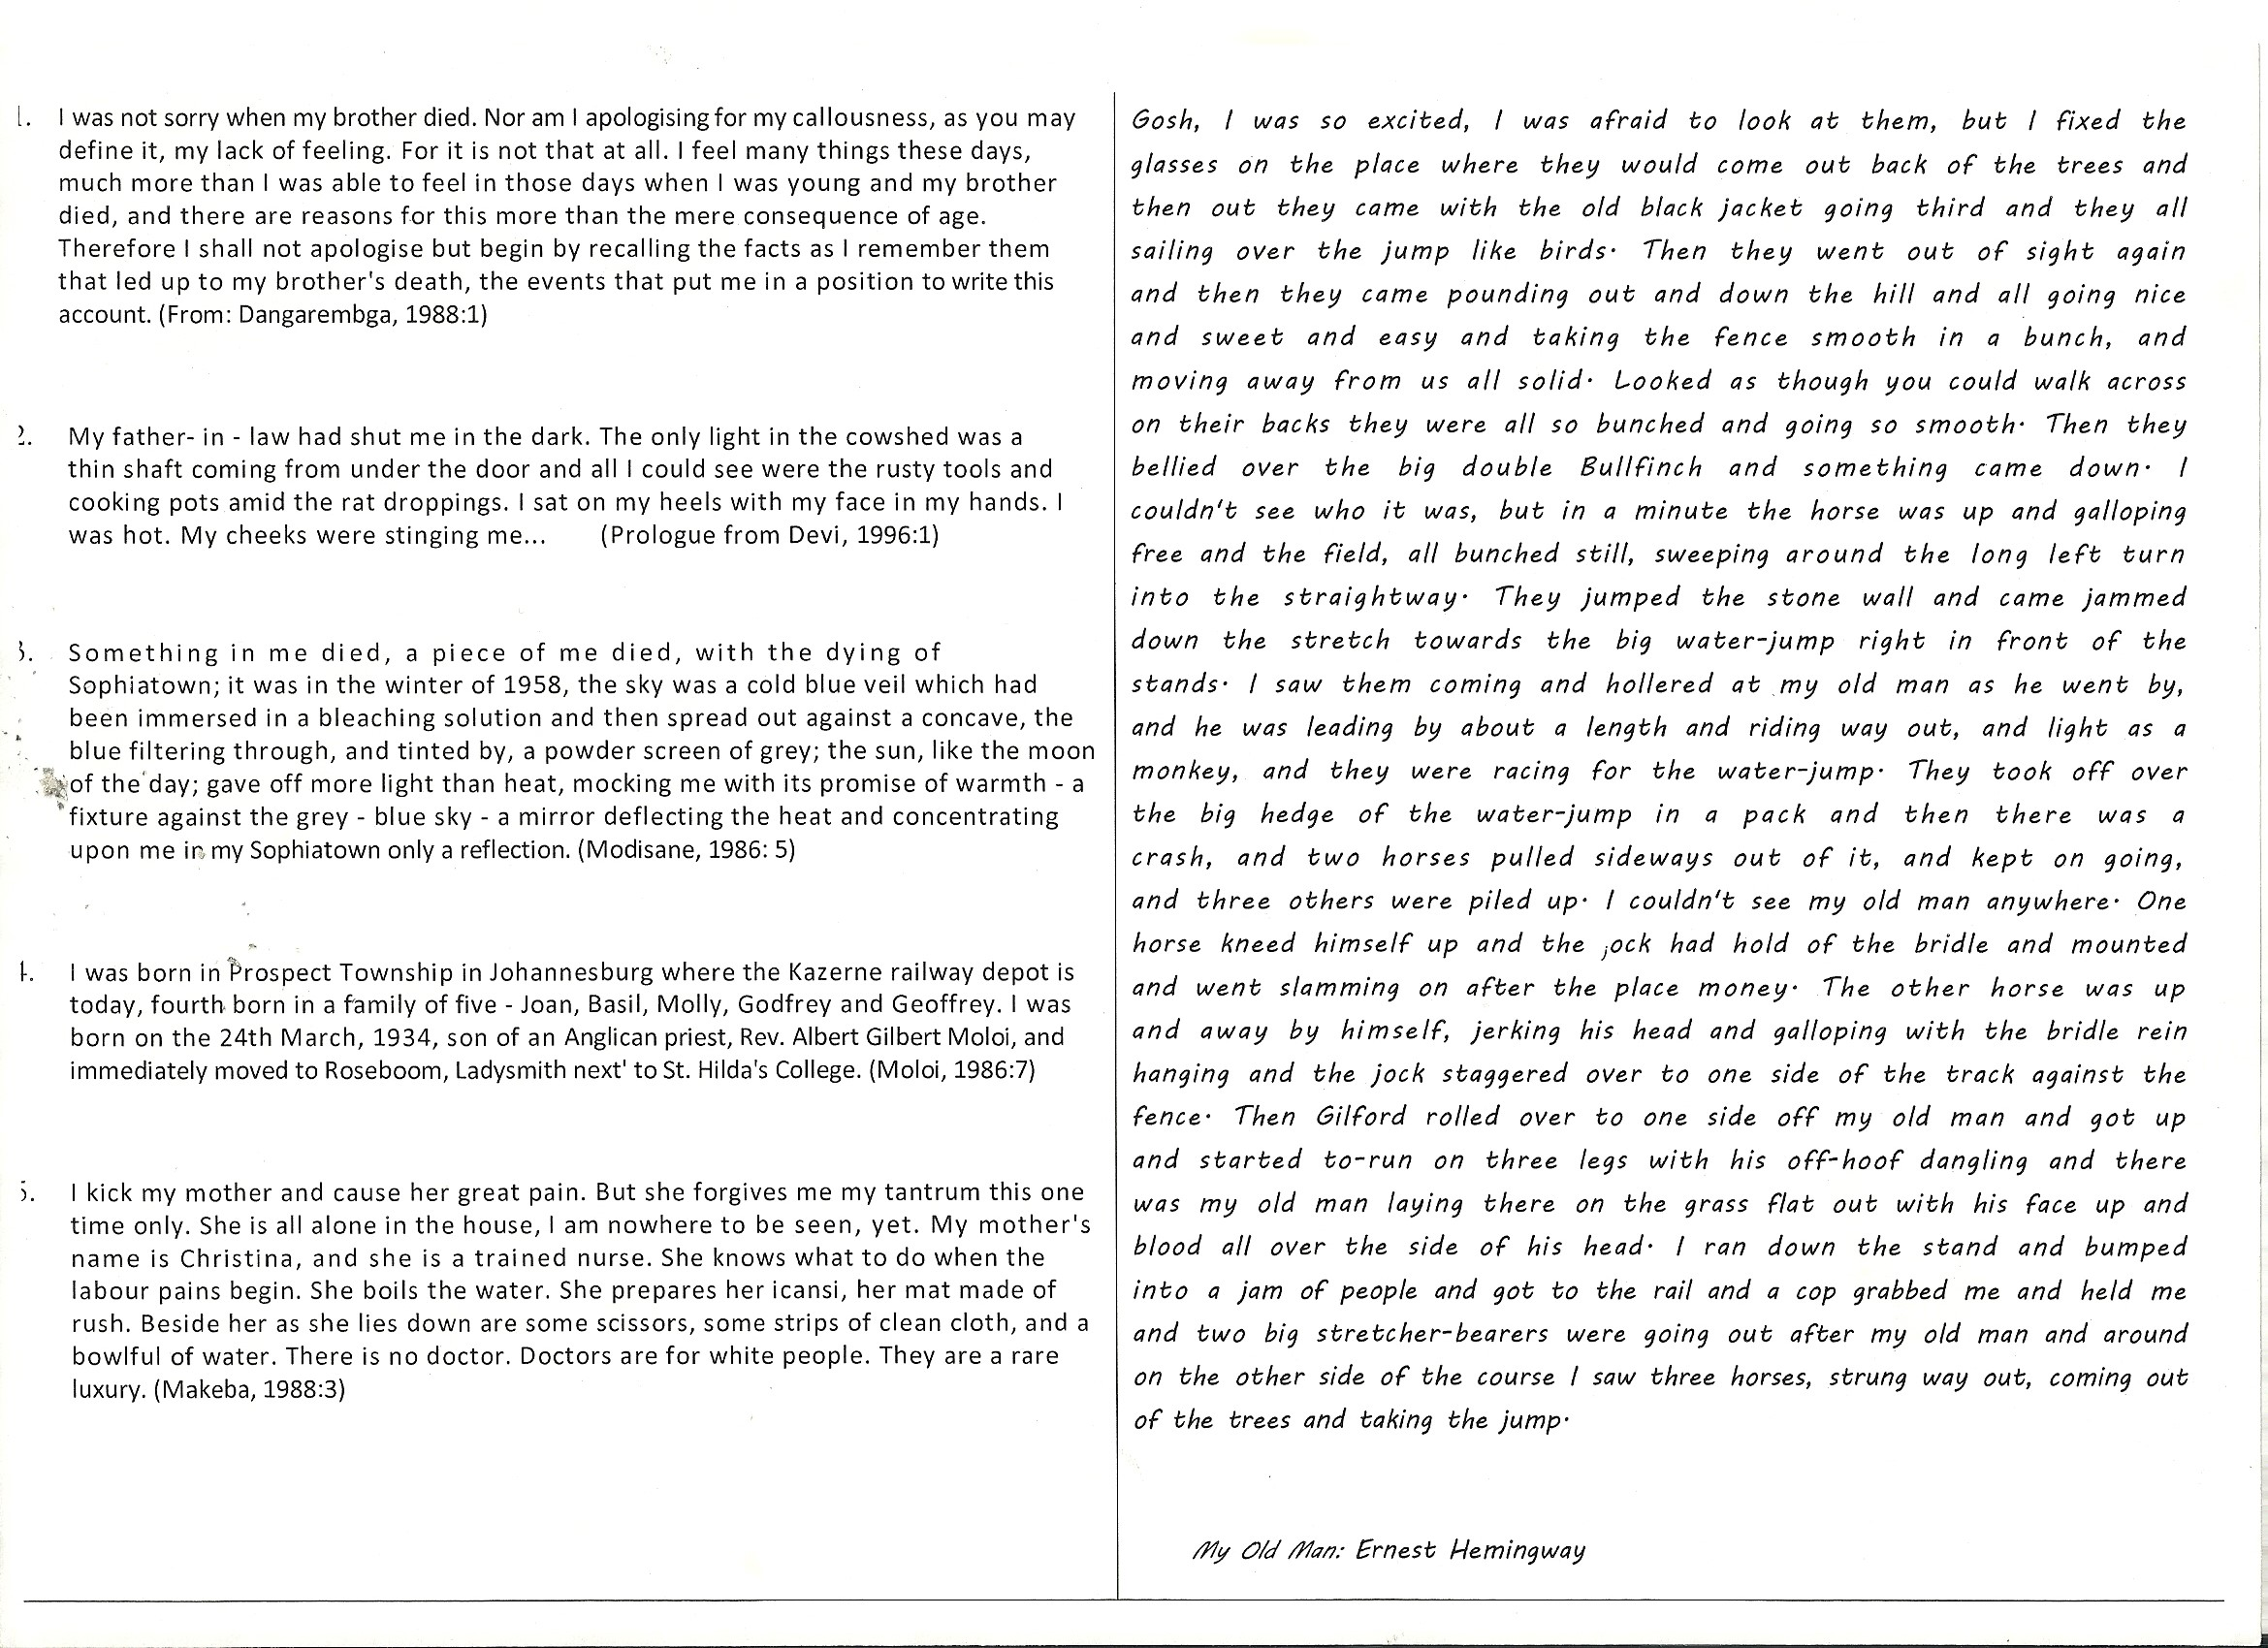 011 Good Vs Essay Intros For Essays Unusual Best Introductions Narrative Examples Full